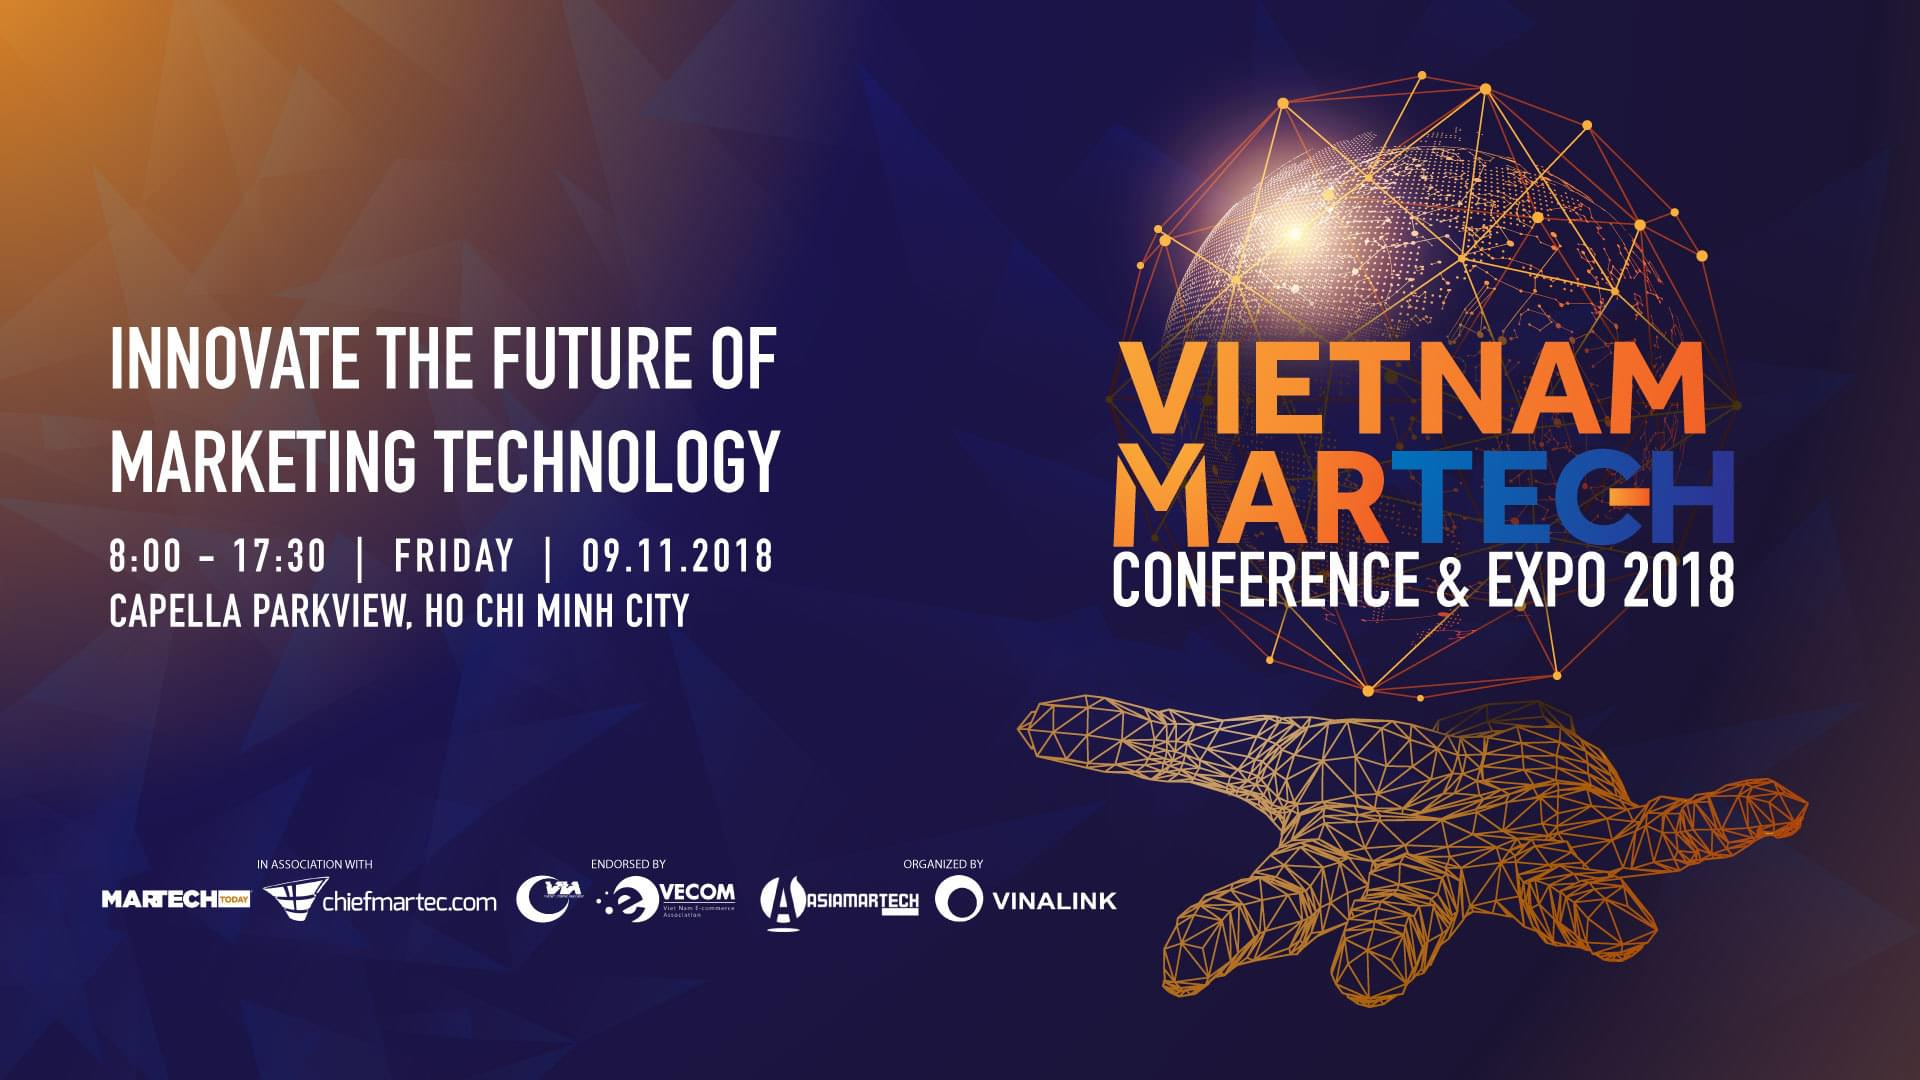 Vietnam MarTech Conferencce & Expo 2018